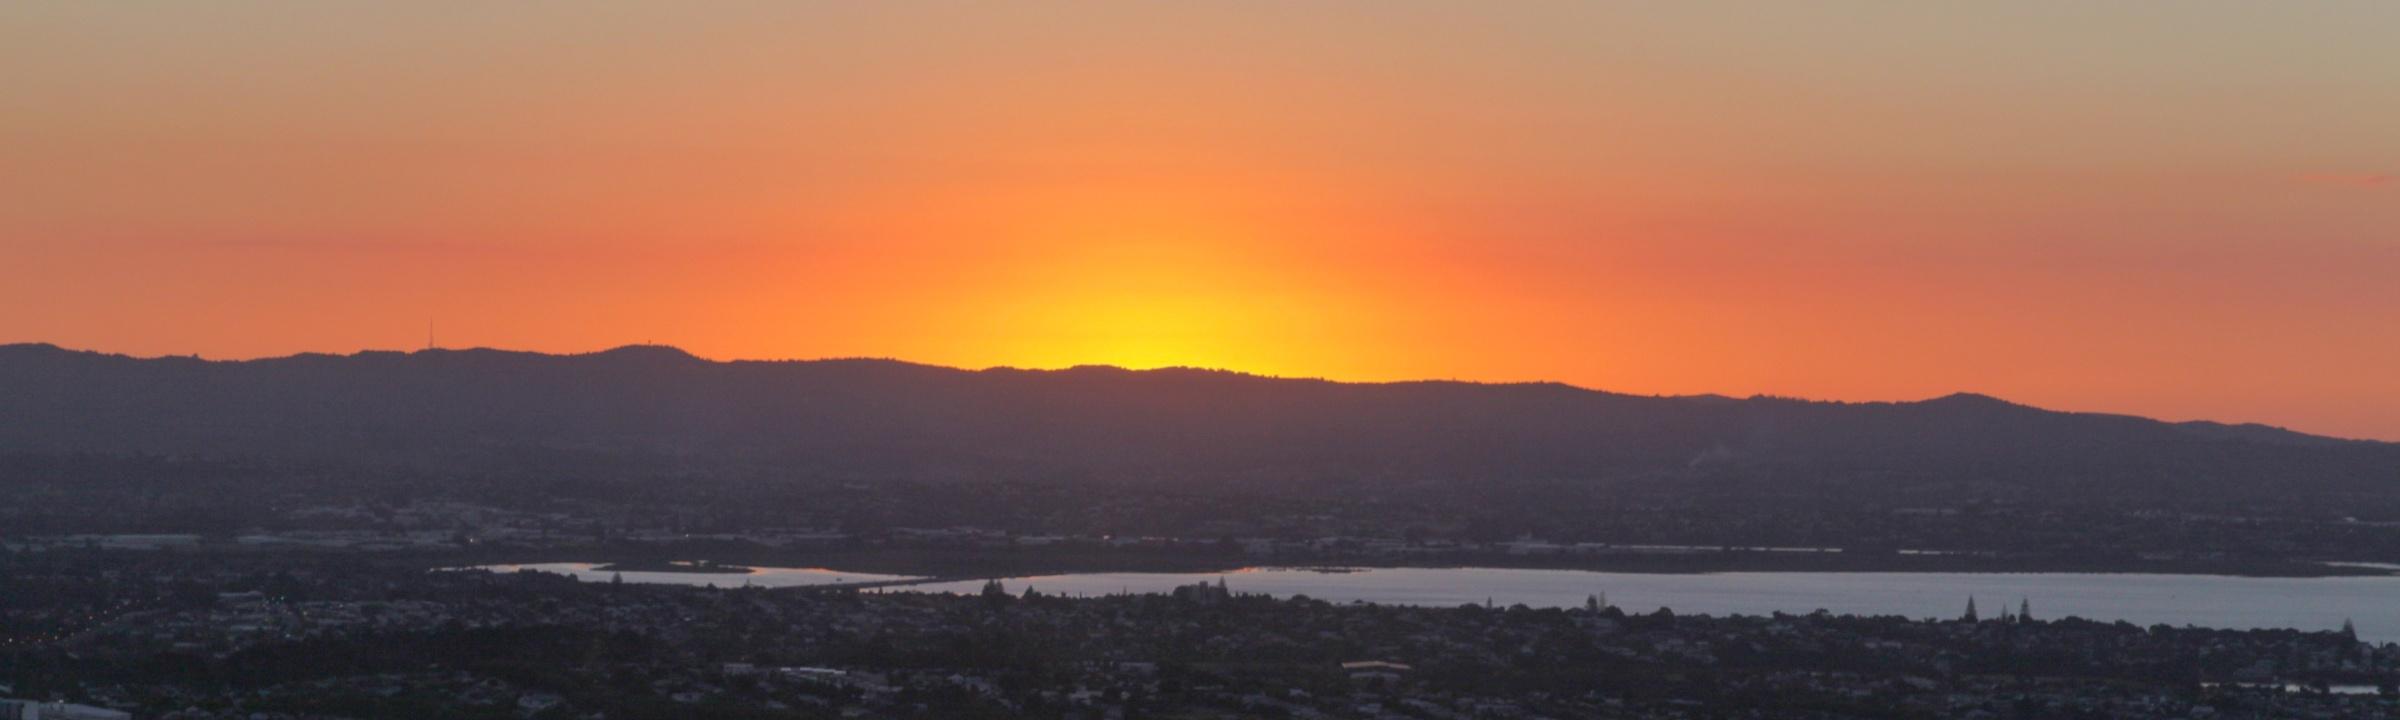 Sonnenuntergang über Auckland Neuseeland